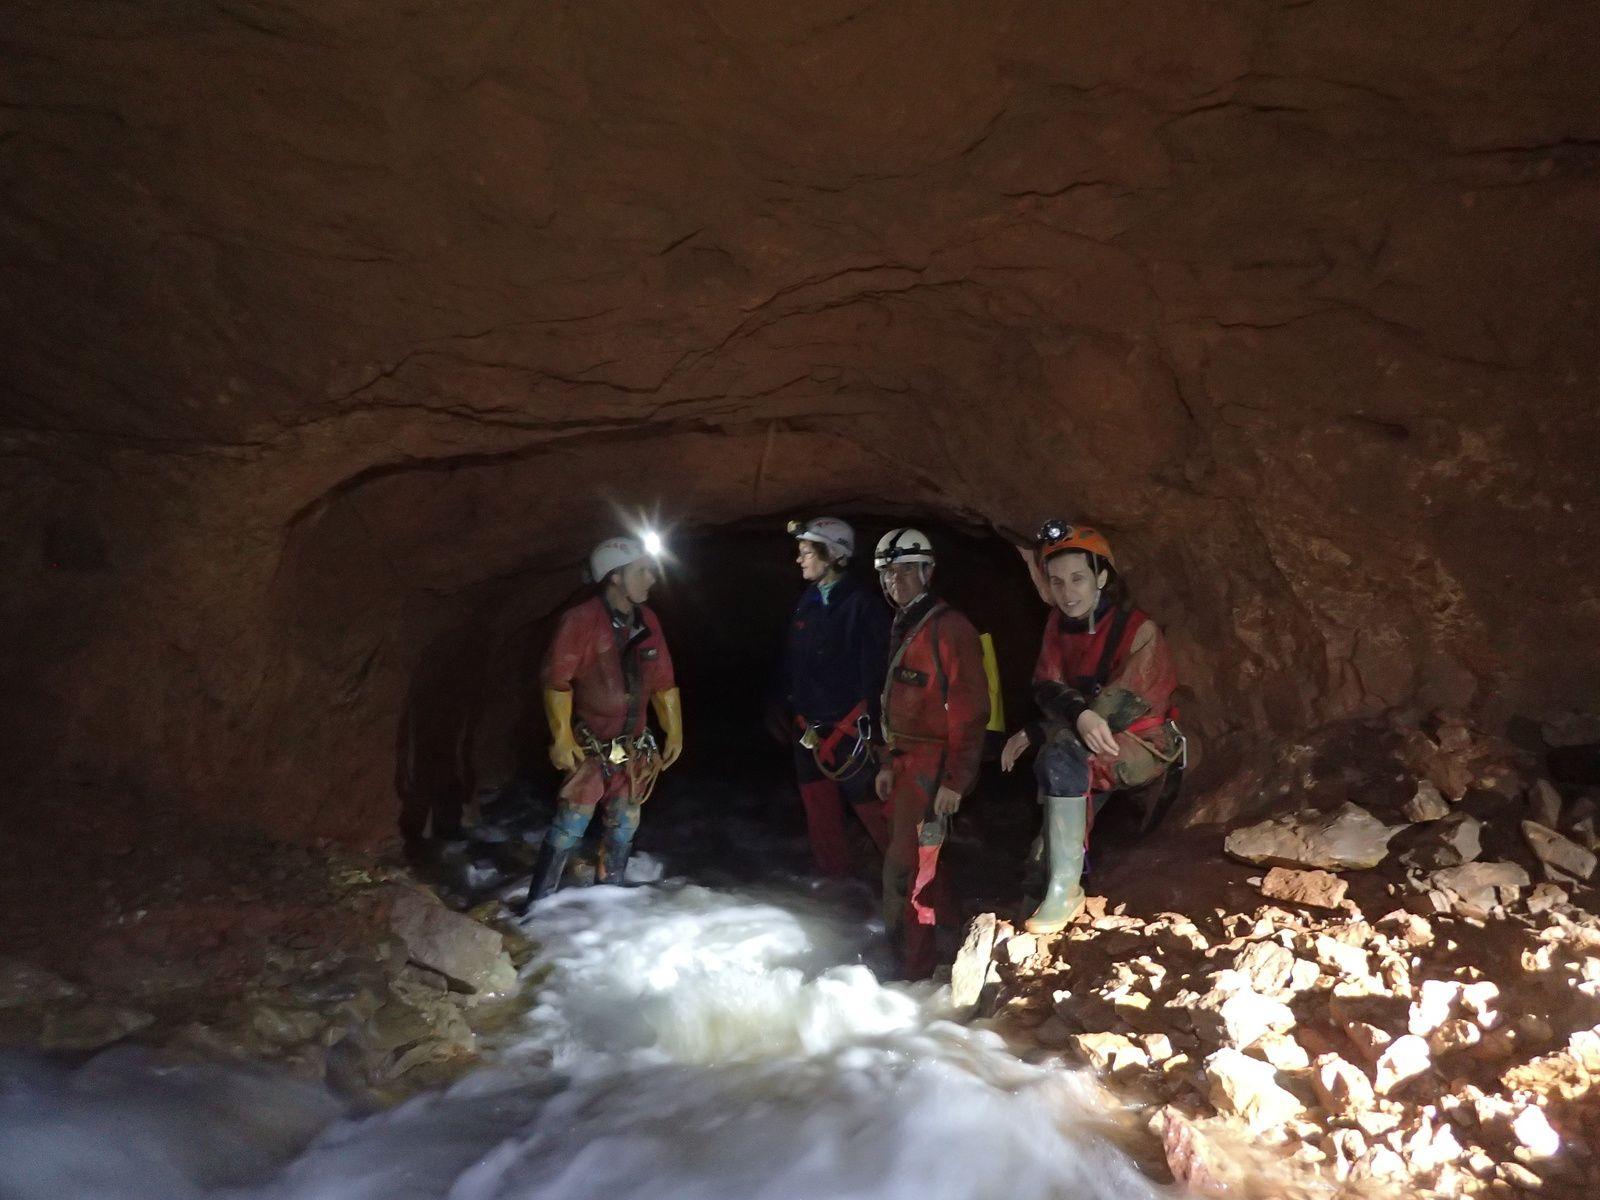 La mine de Mazaugues le 26 novembre 2016.